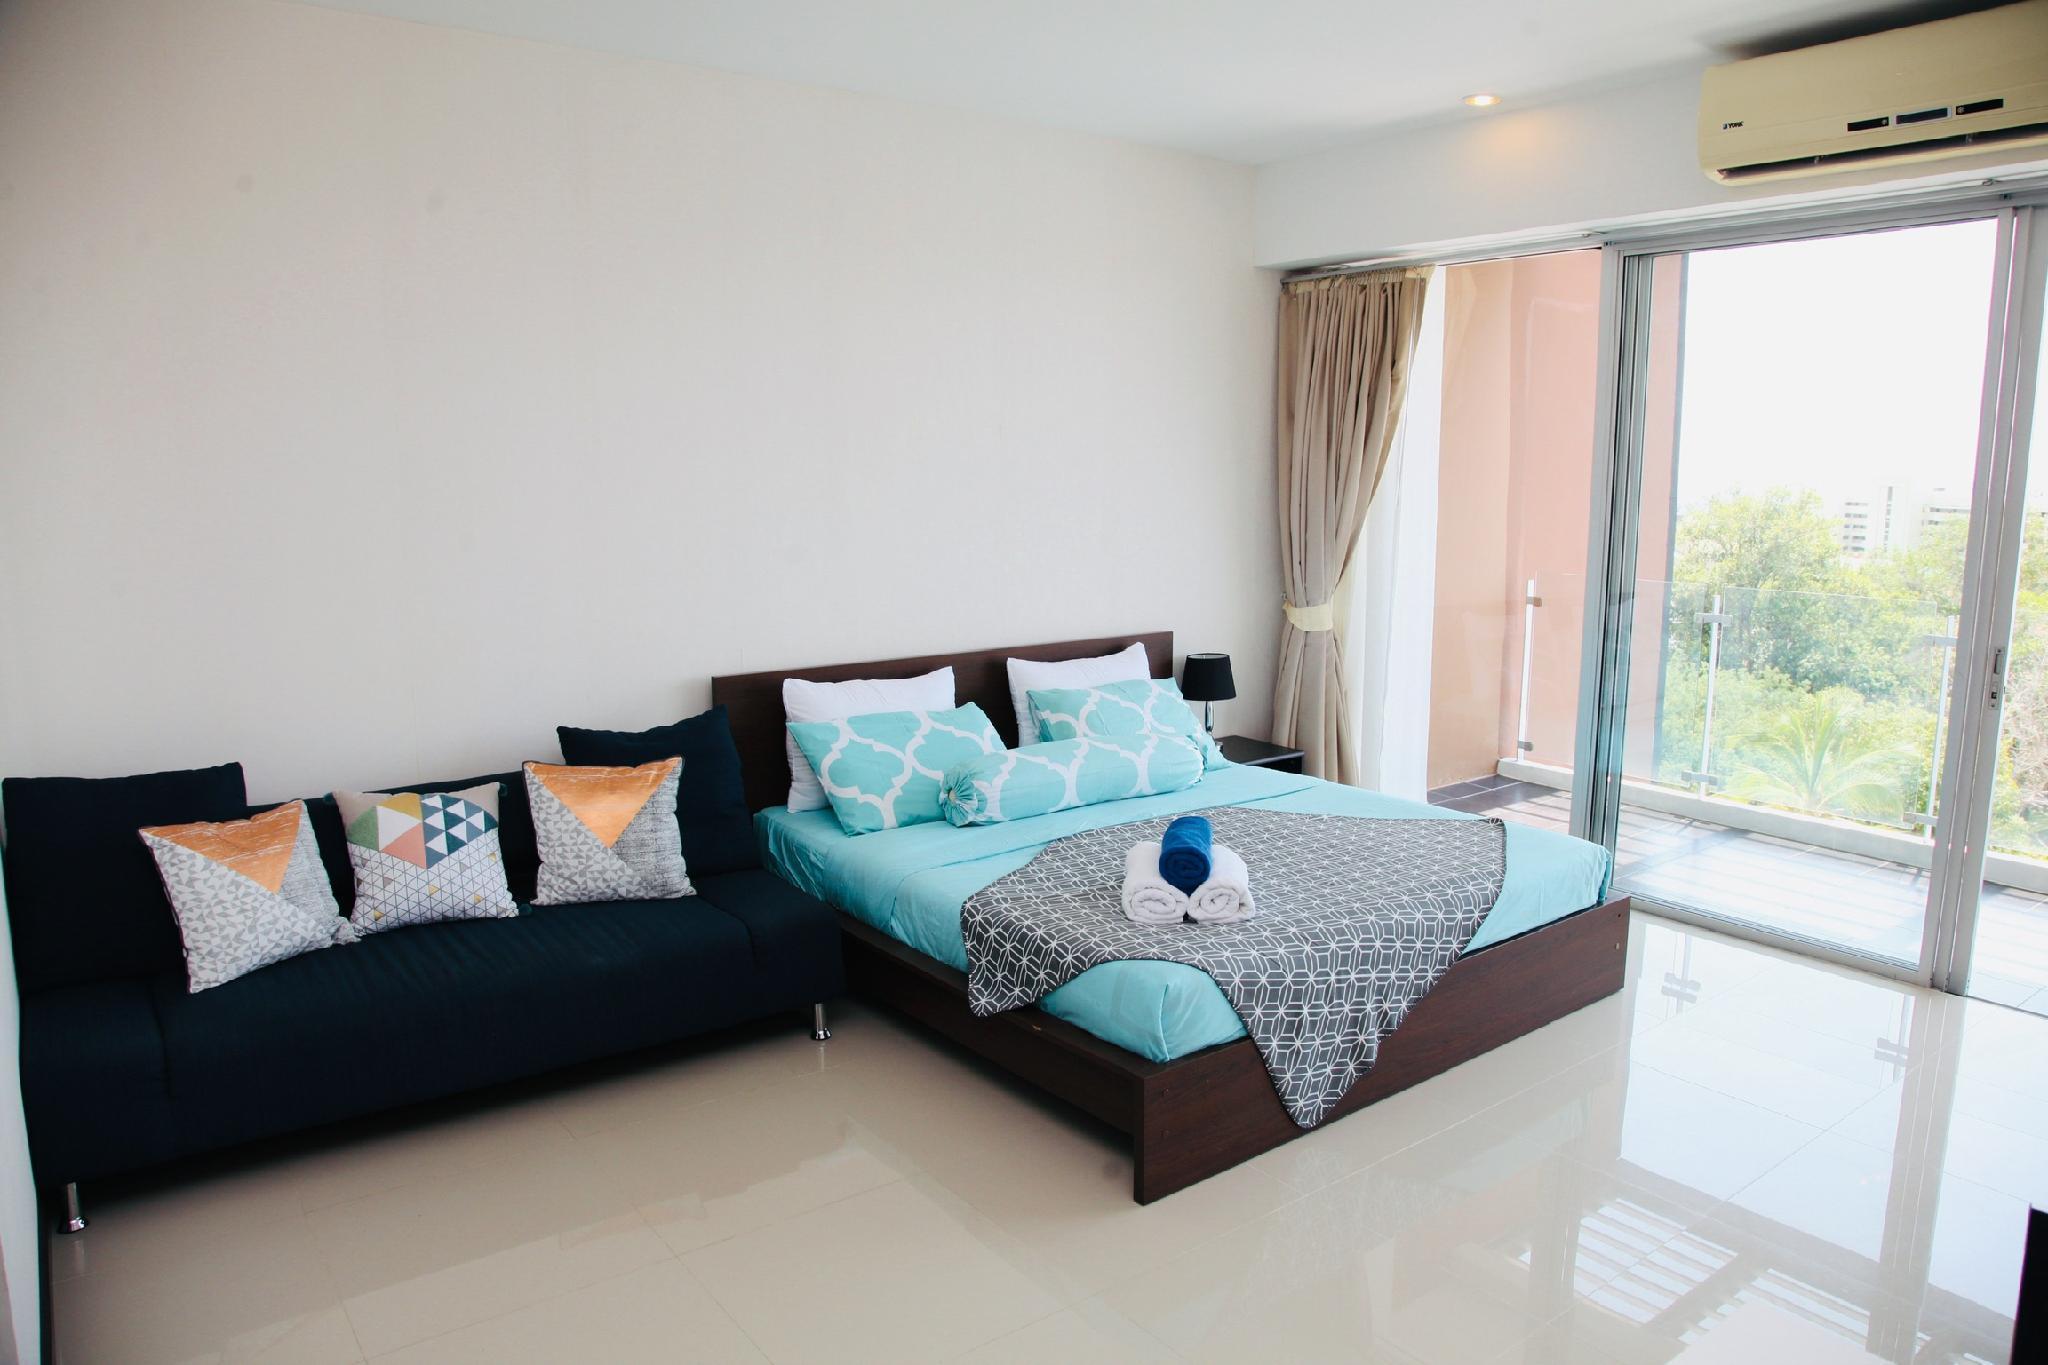 Full seaview apartment near Karon beach สตูดิโอ อพาร์ตเมนต์ 1 ห้องน้ำส่วนตัว ขนาด 50 ตร.ม. – กะรน